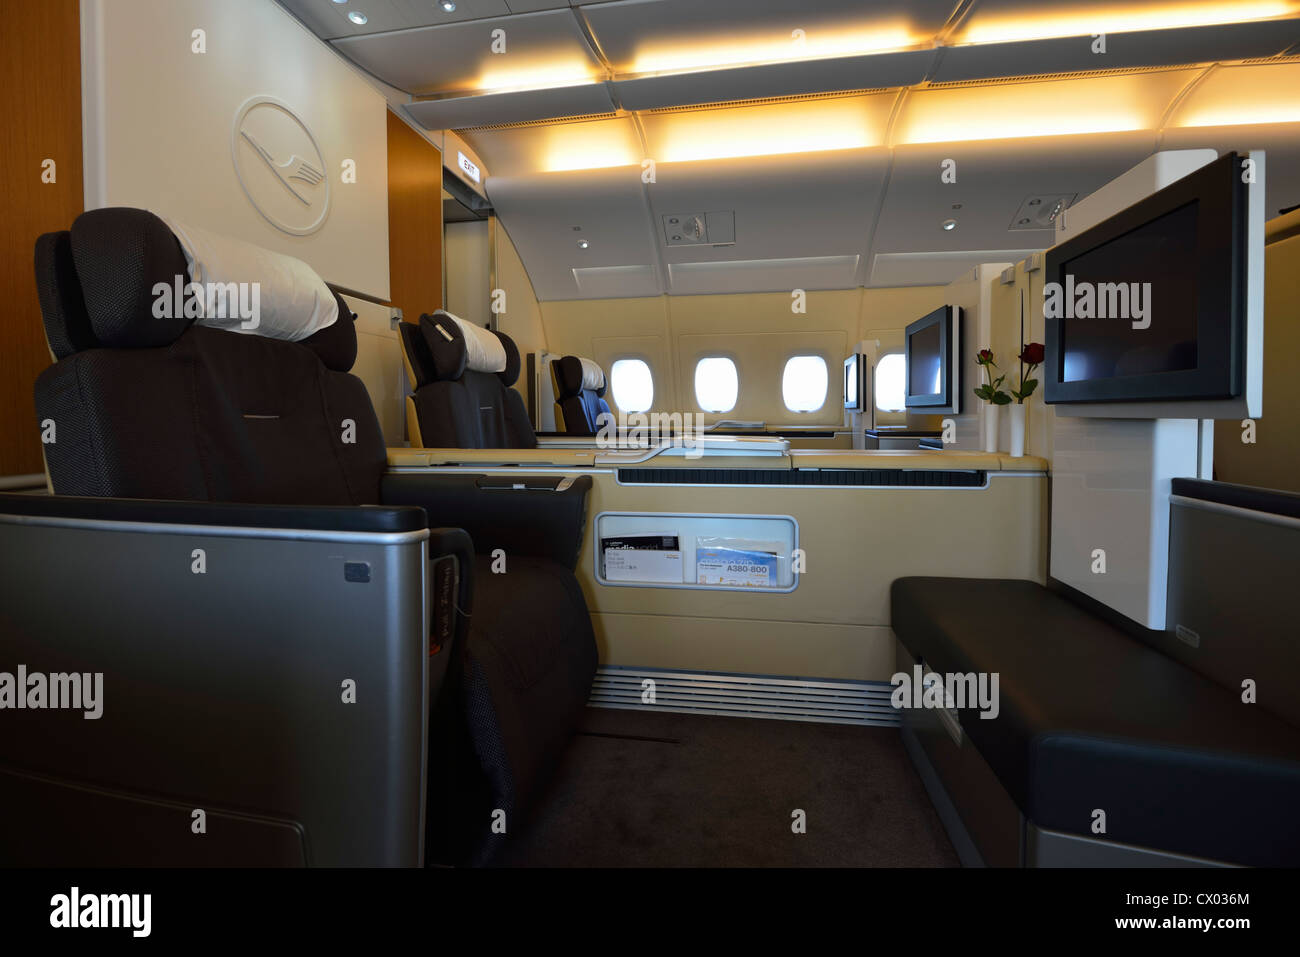 airbus a380 interior stockfotos airbus a380 interior bilder seite 2 alamy. Black Bedroom Furniture Sets. Home Design Ideas